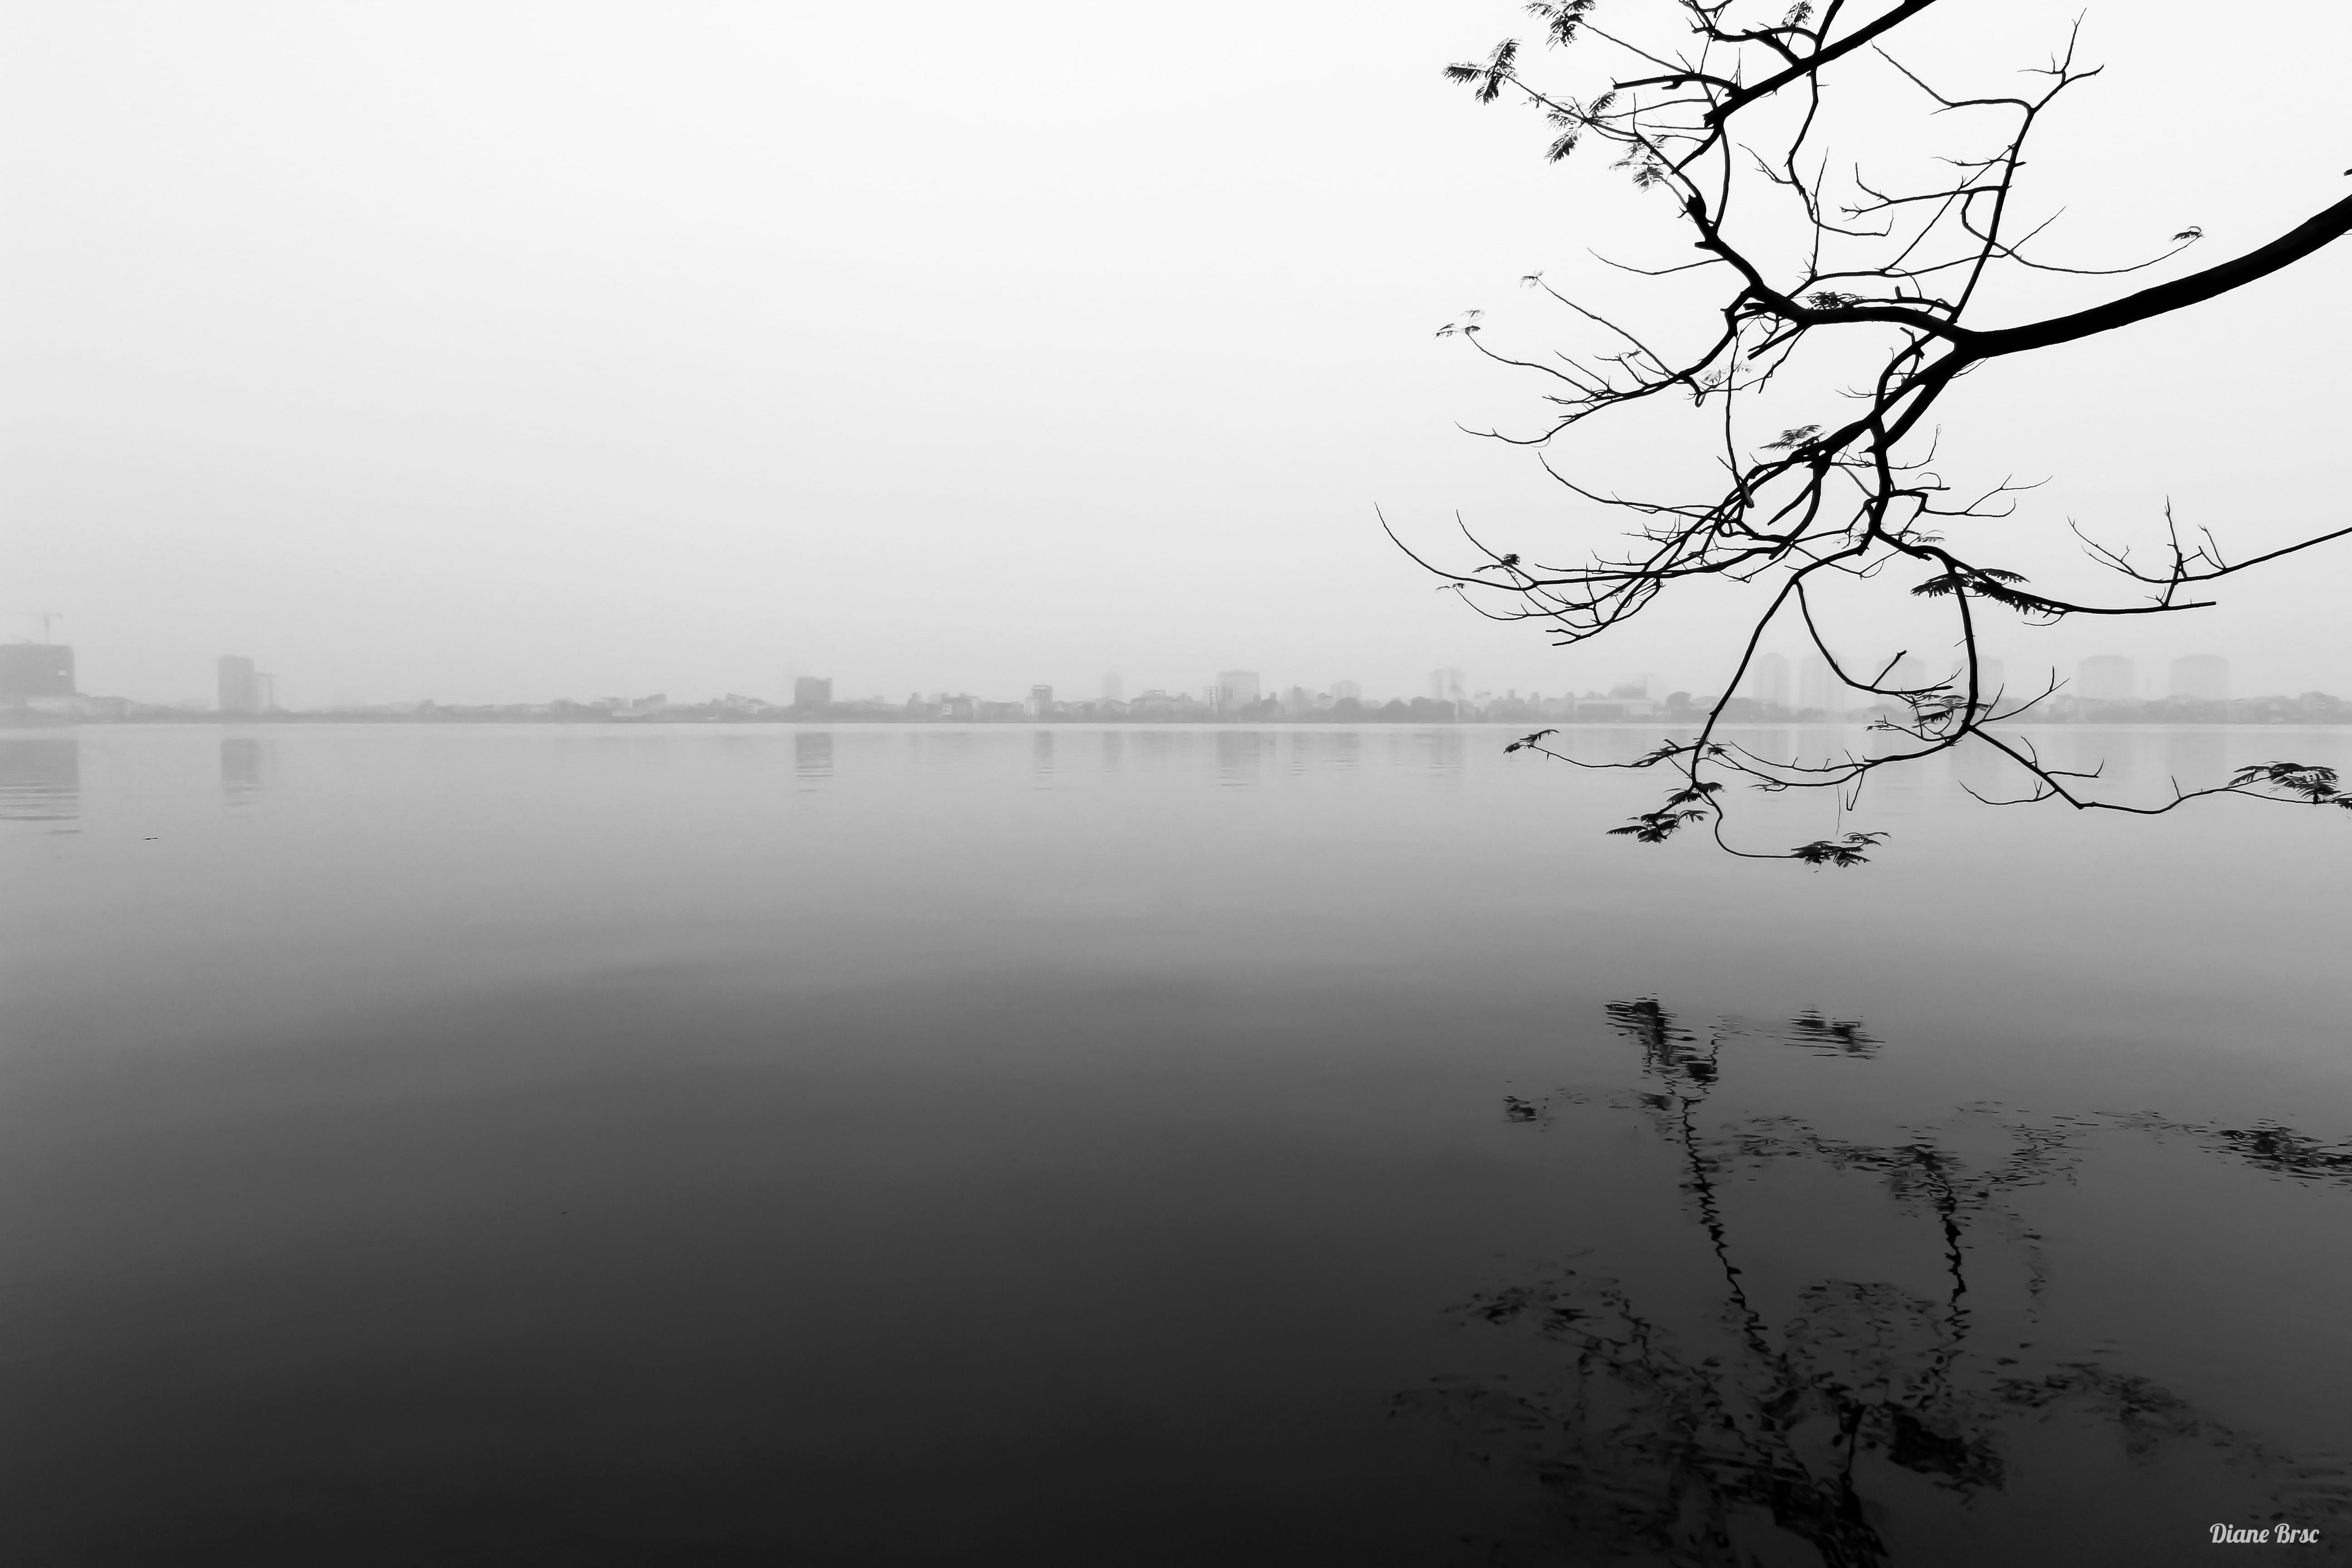 Cloudy Tây Hồ